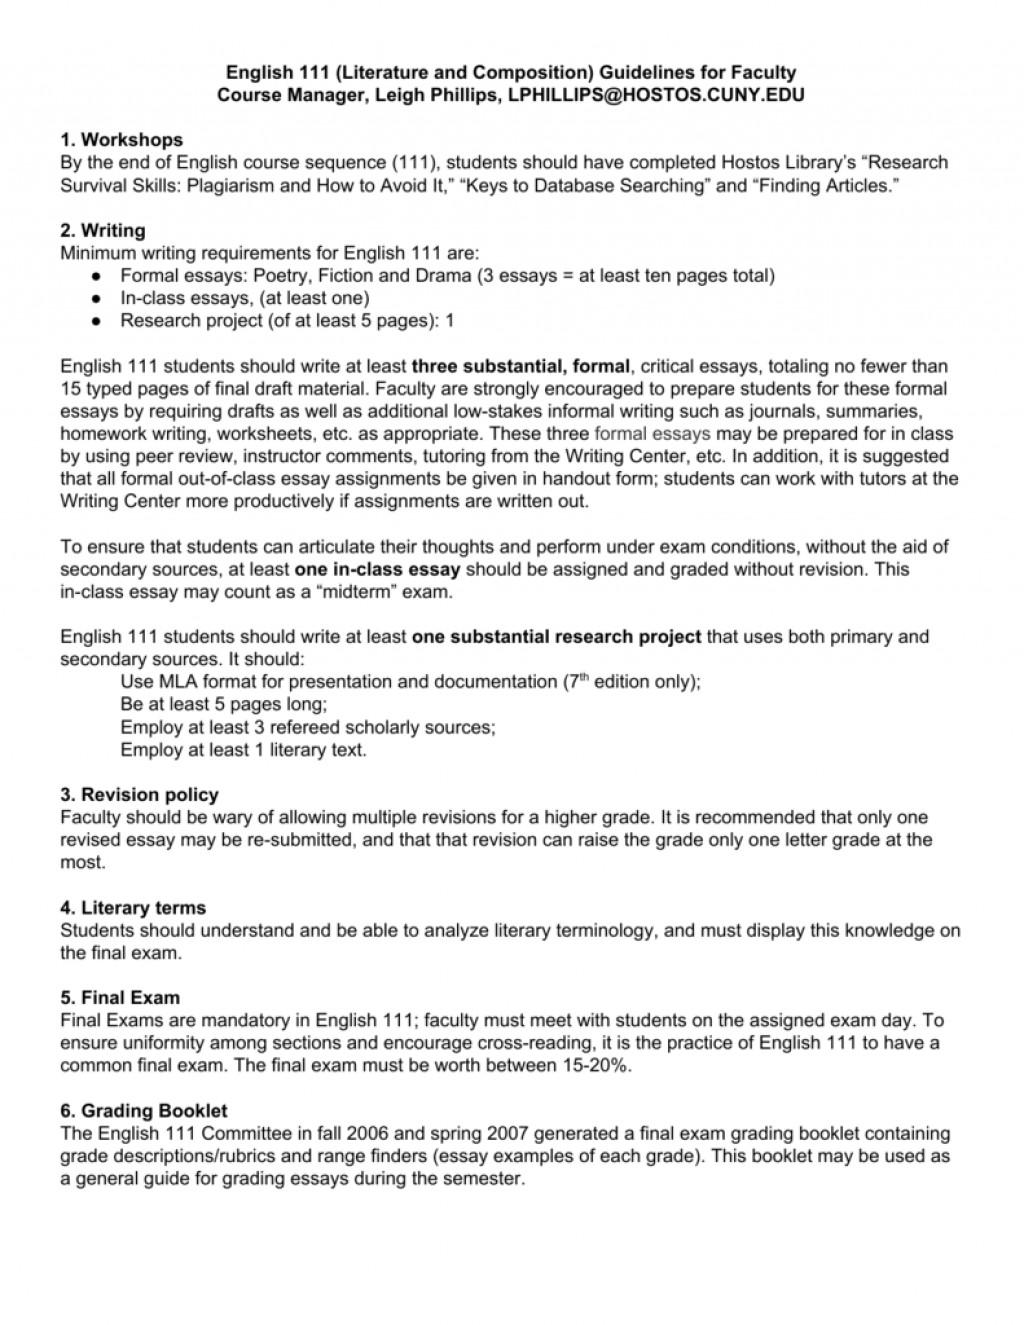 007 Essay Example 008210852 1 Writing On Examination Rare Day Large